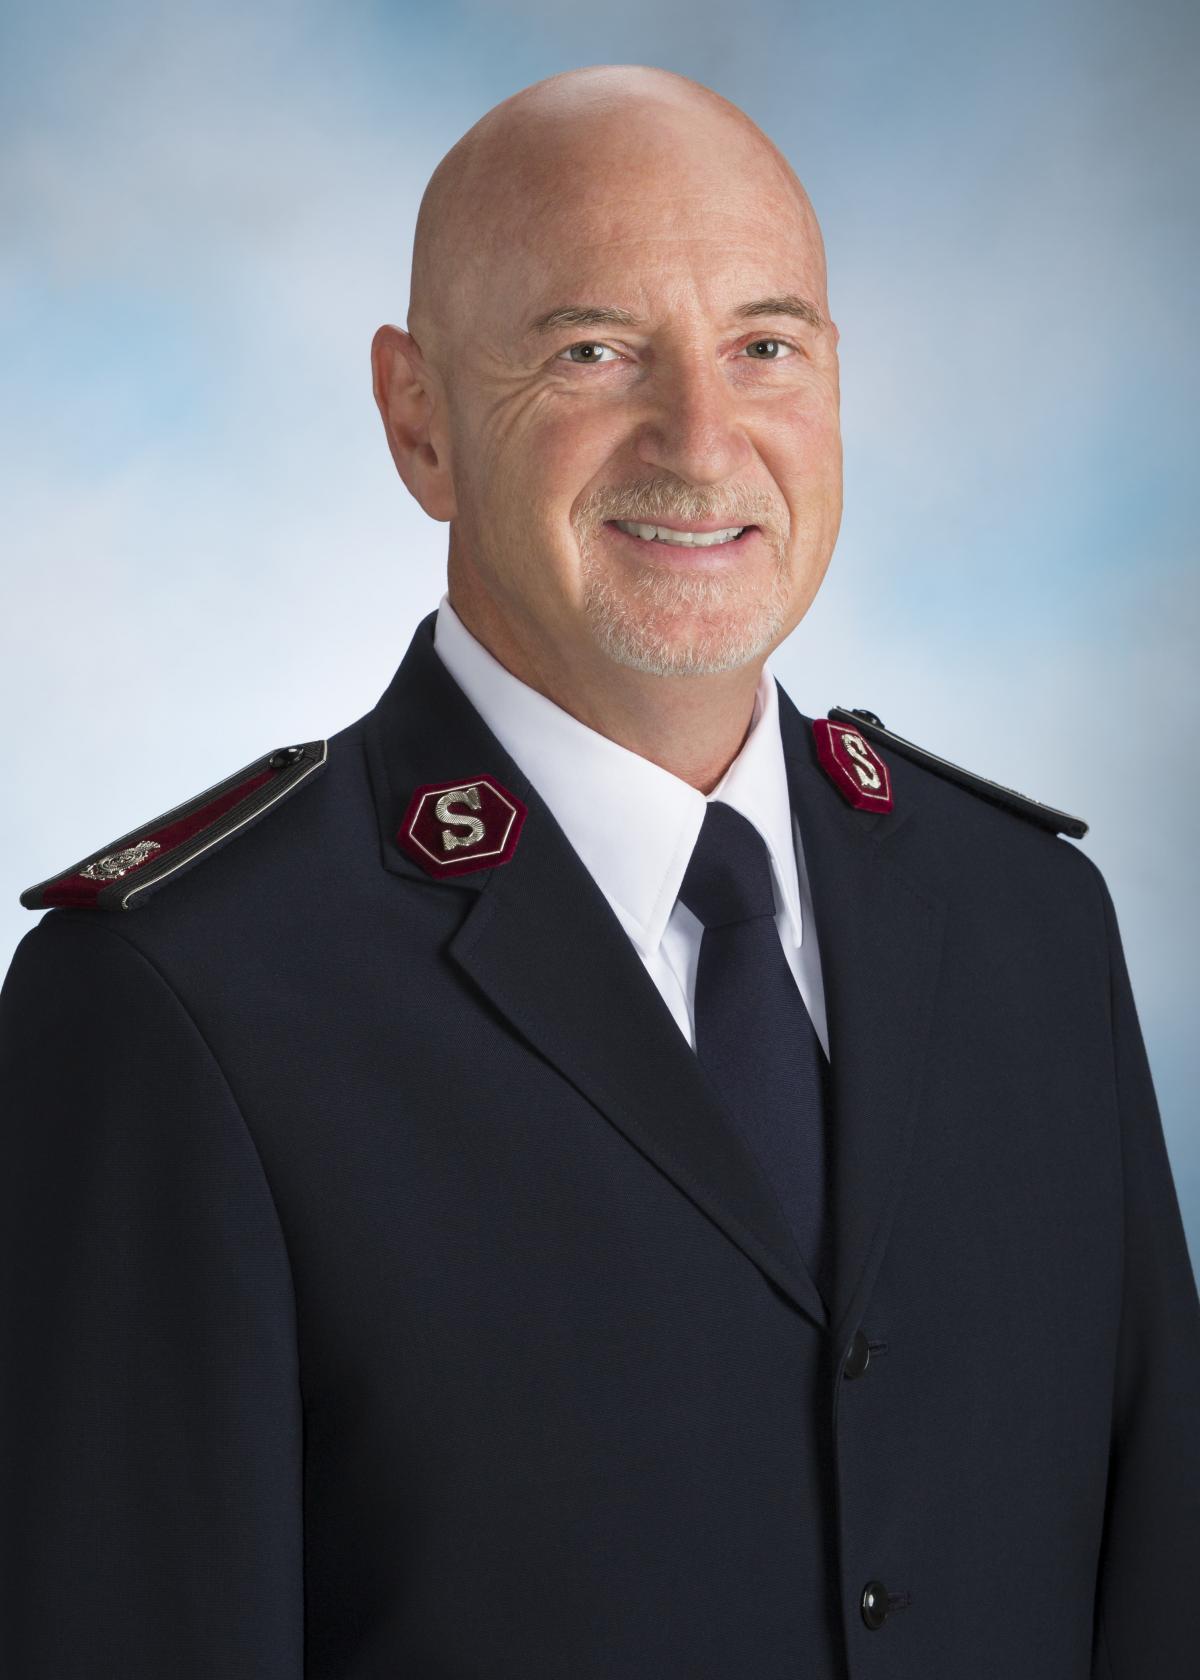 Kommissär Brad Bailey, Territorialleiter, Territorium USA Mitte / Commissaire Brad Bailey, Commandant territorial, USA Centre.